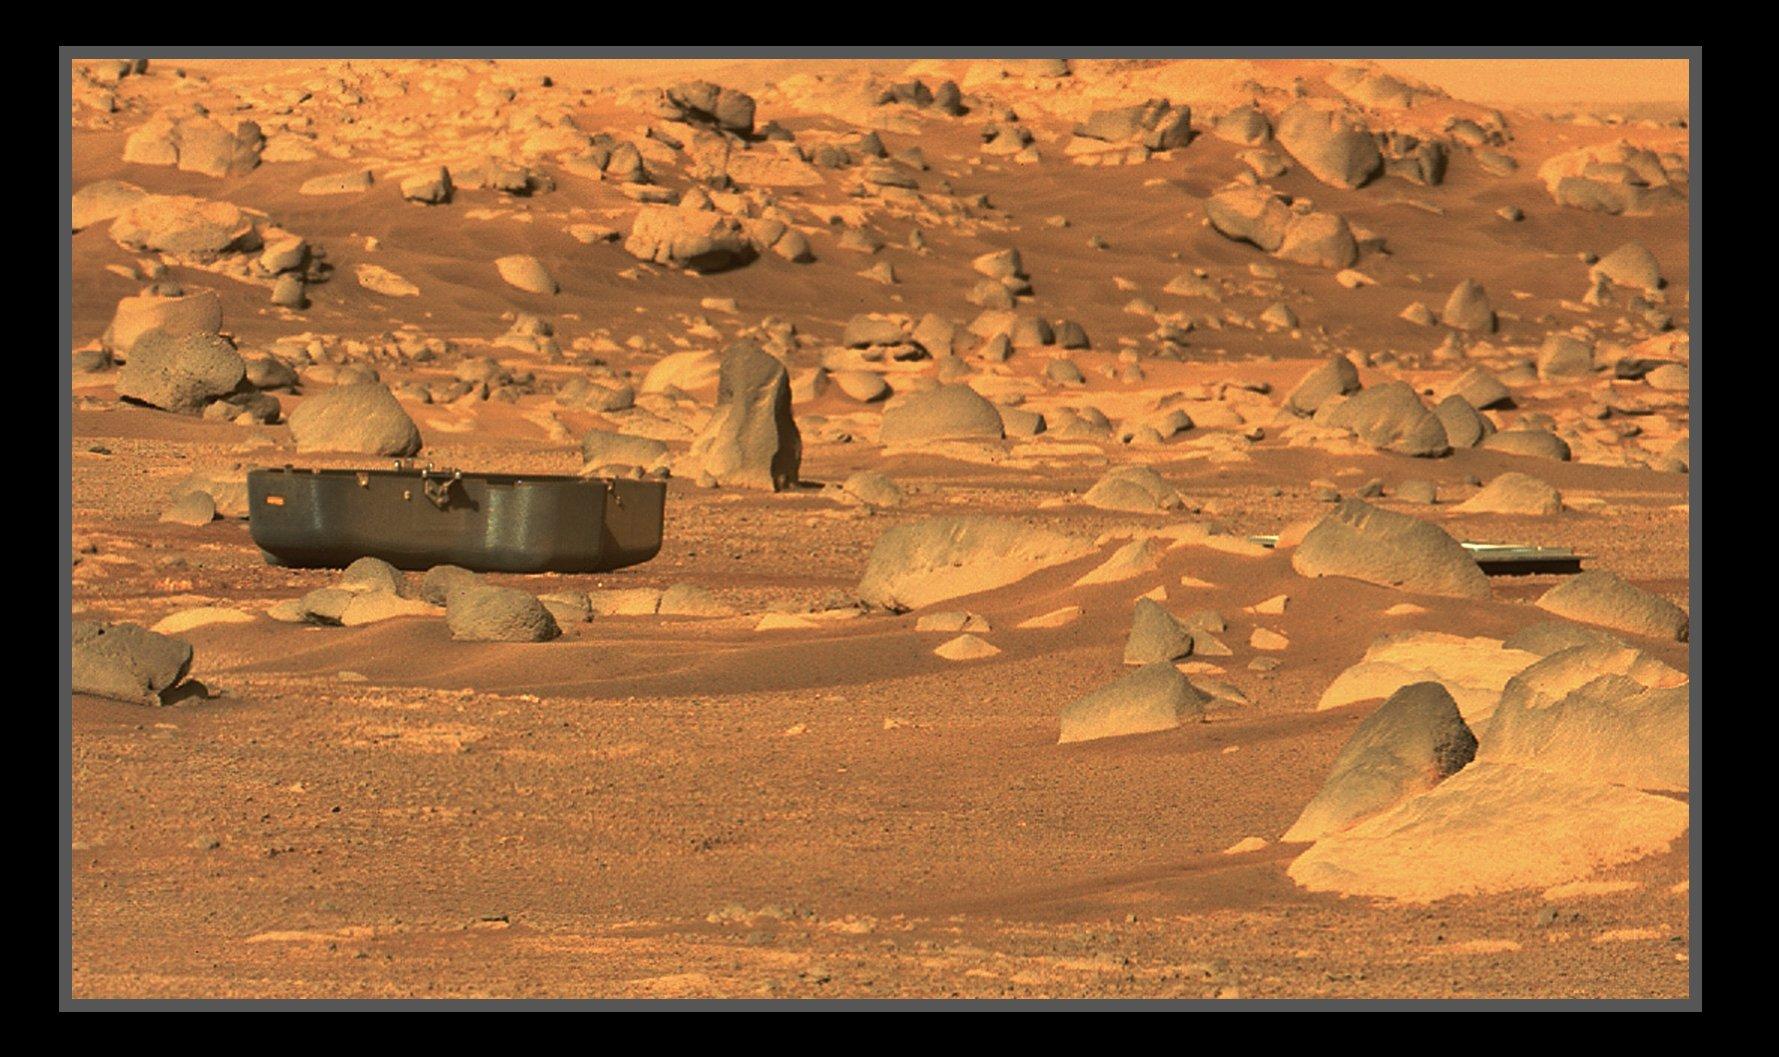 Mars 2020 (Perseverance) : exploration du cratère Jezero - Page 7 EyABfAMWYAAwVm2?format=jpg&name=large